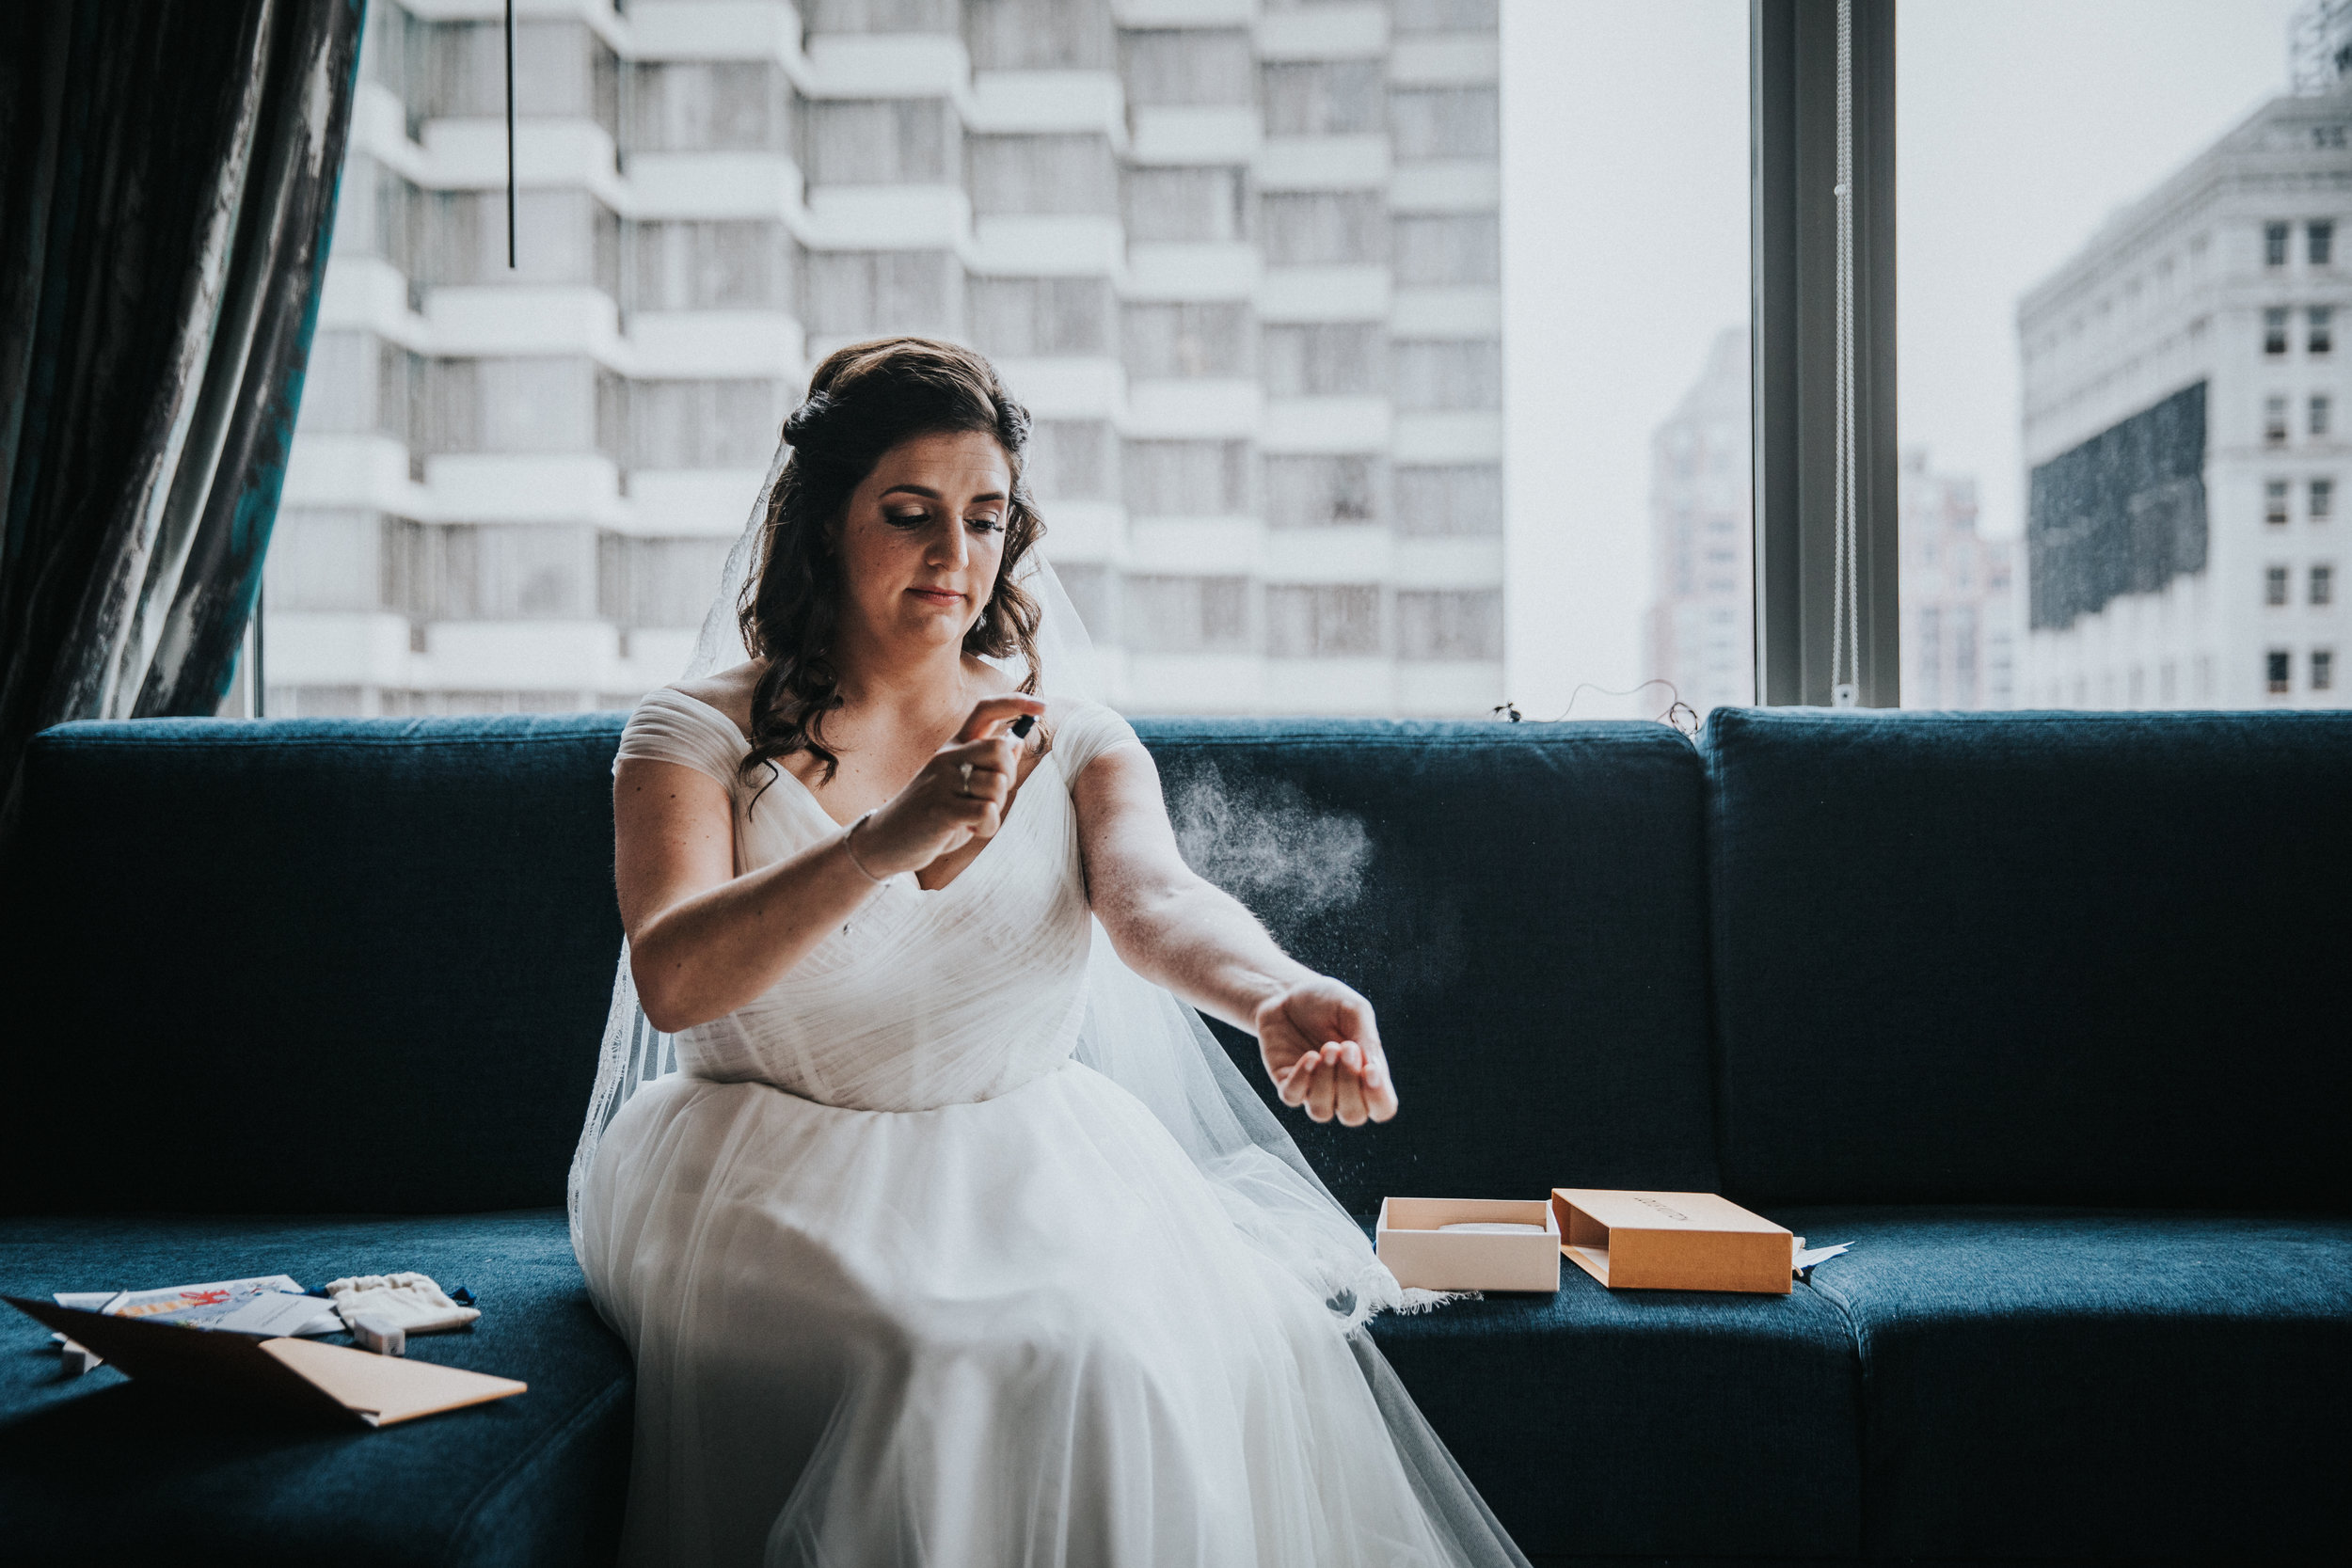 JennaLynnPhotography-NJWeddingPhotographer-Philadelphia-Wedding-ArtsBallroom-GettingReady-88.jpg